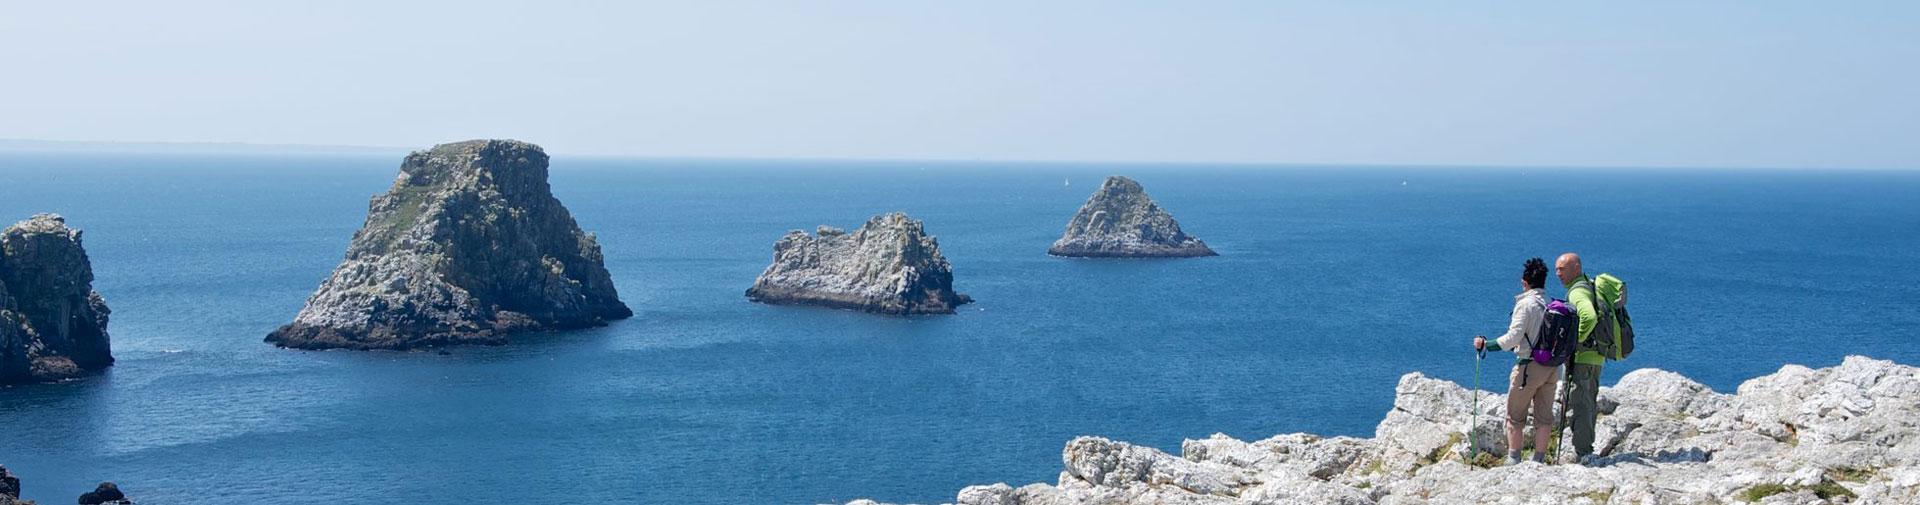 tourisme camaret sur mer